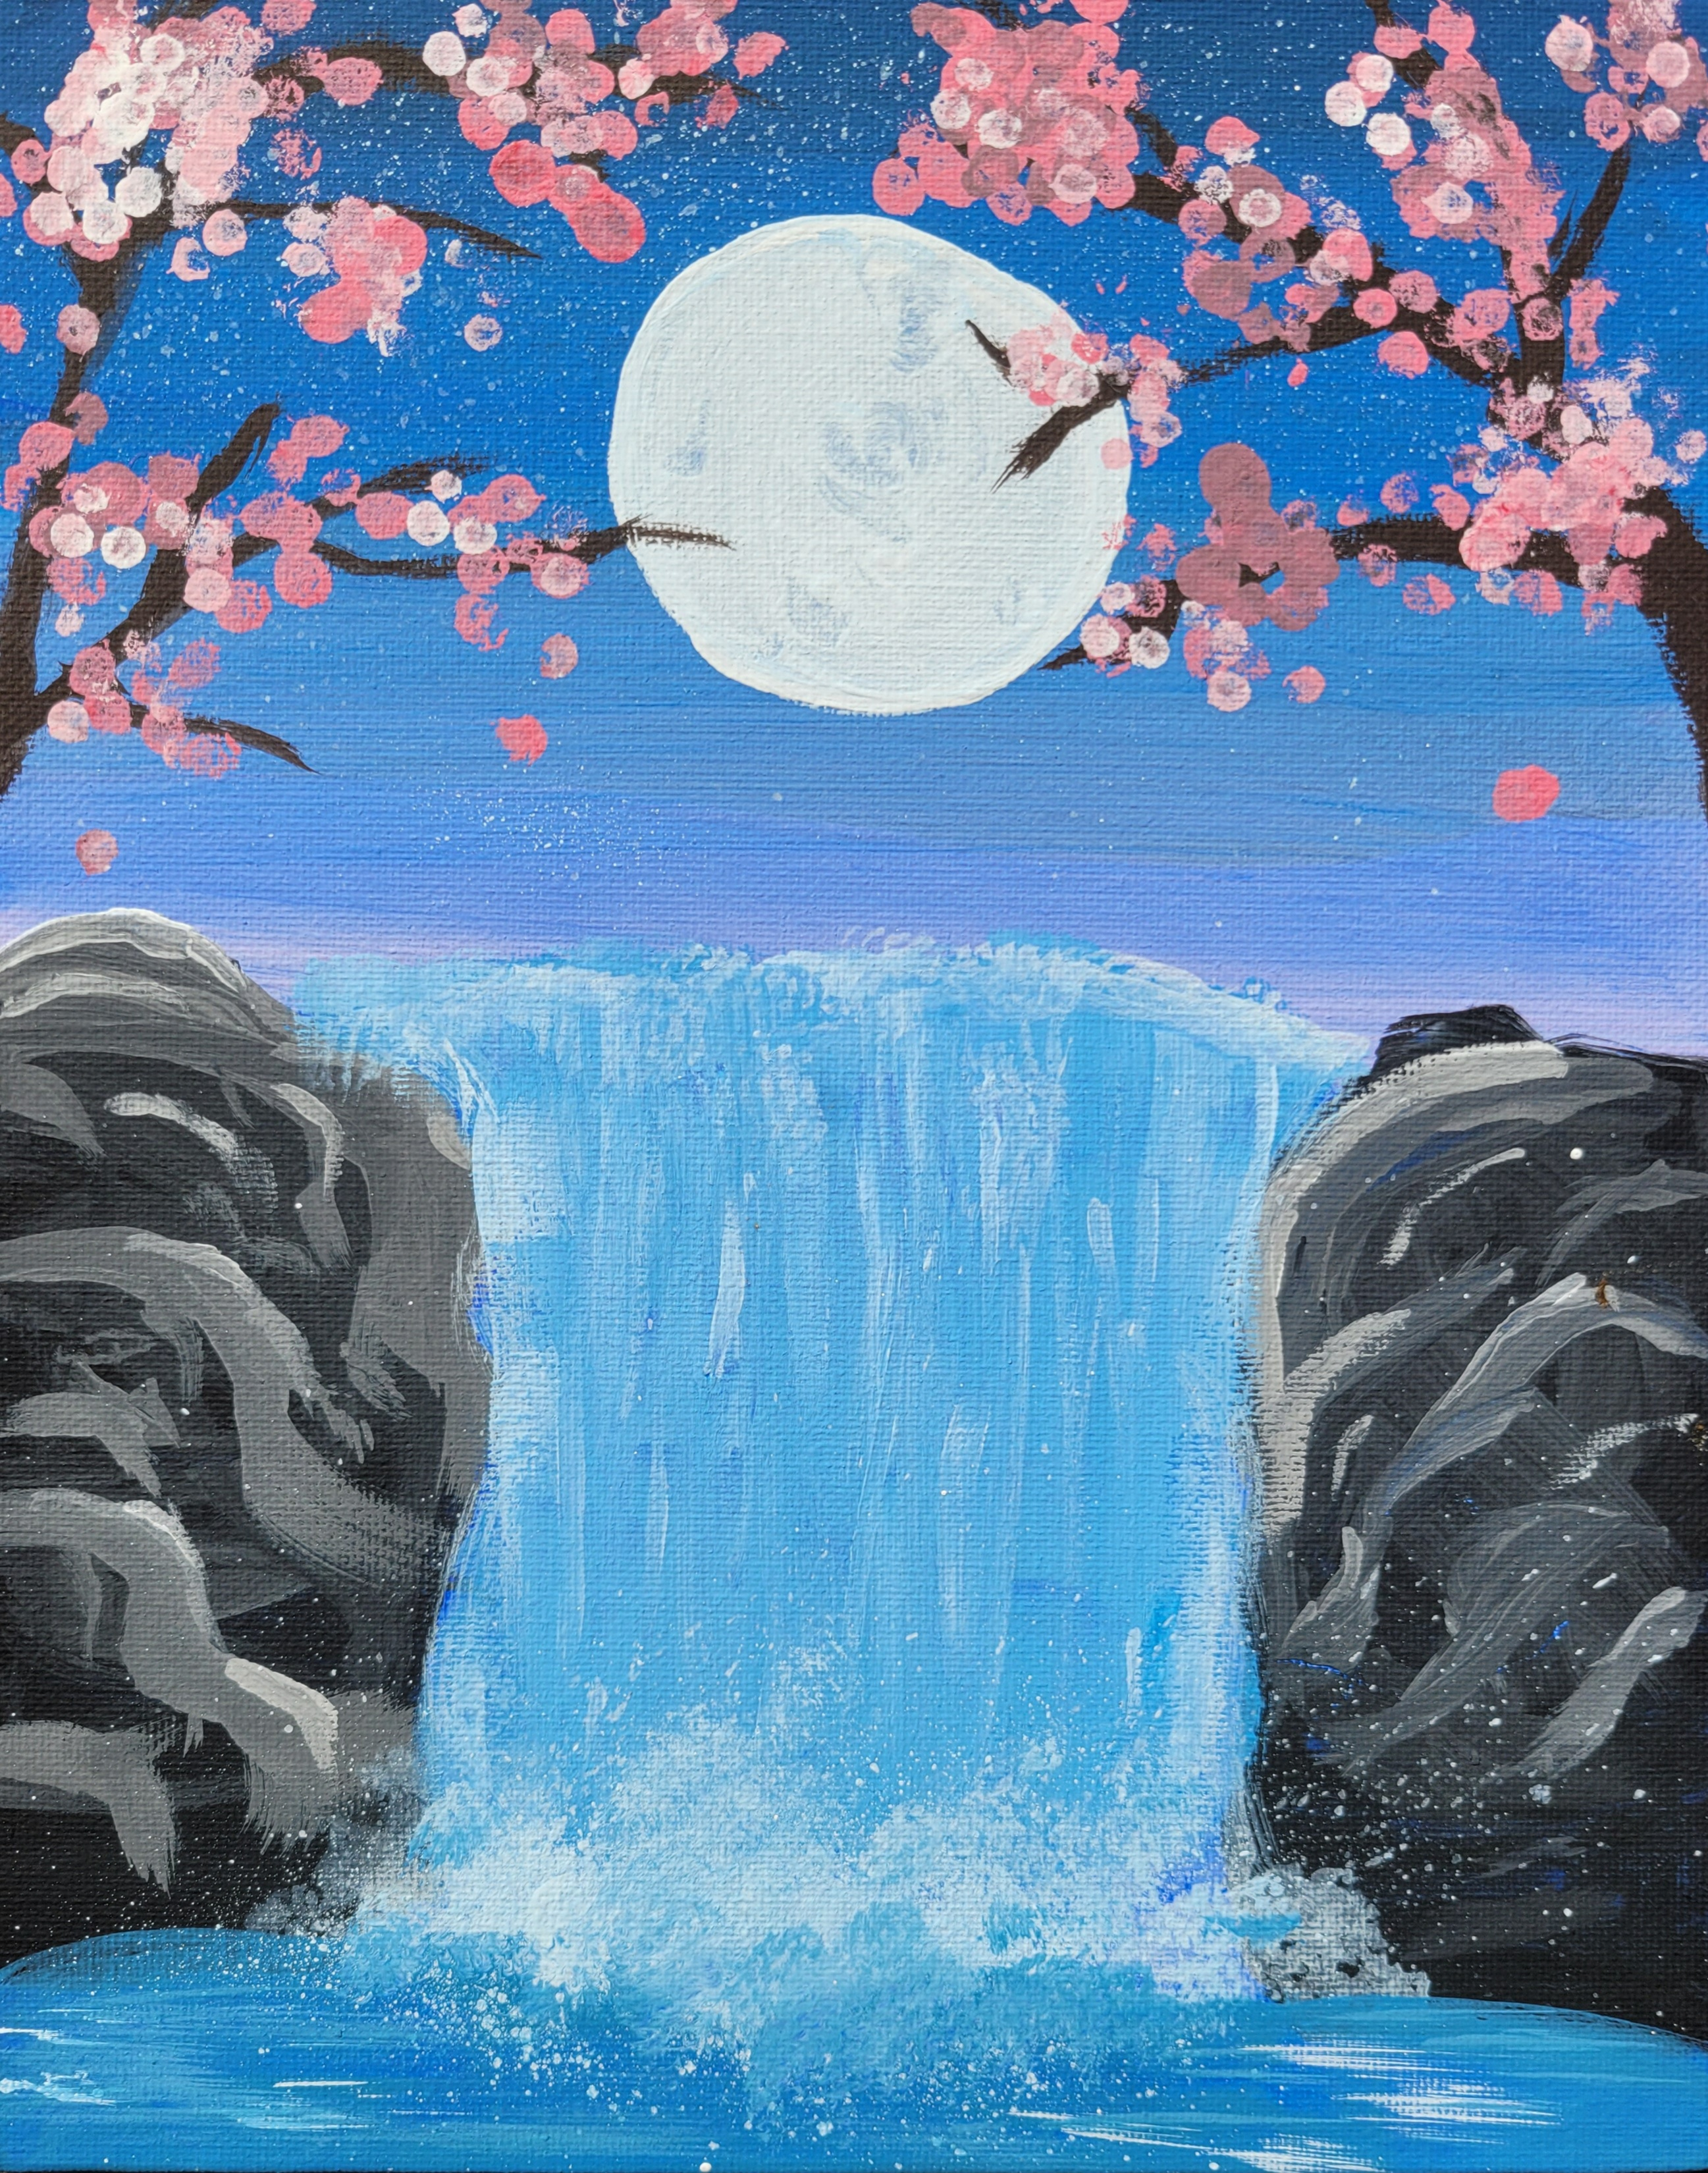 Cherry Blossom Falls by Audrey Bingham